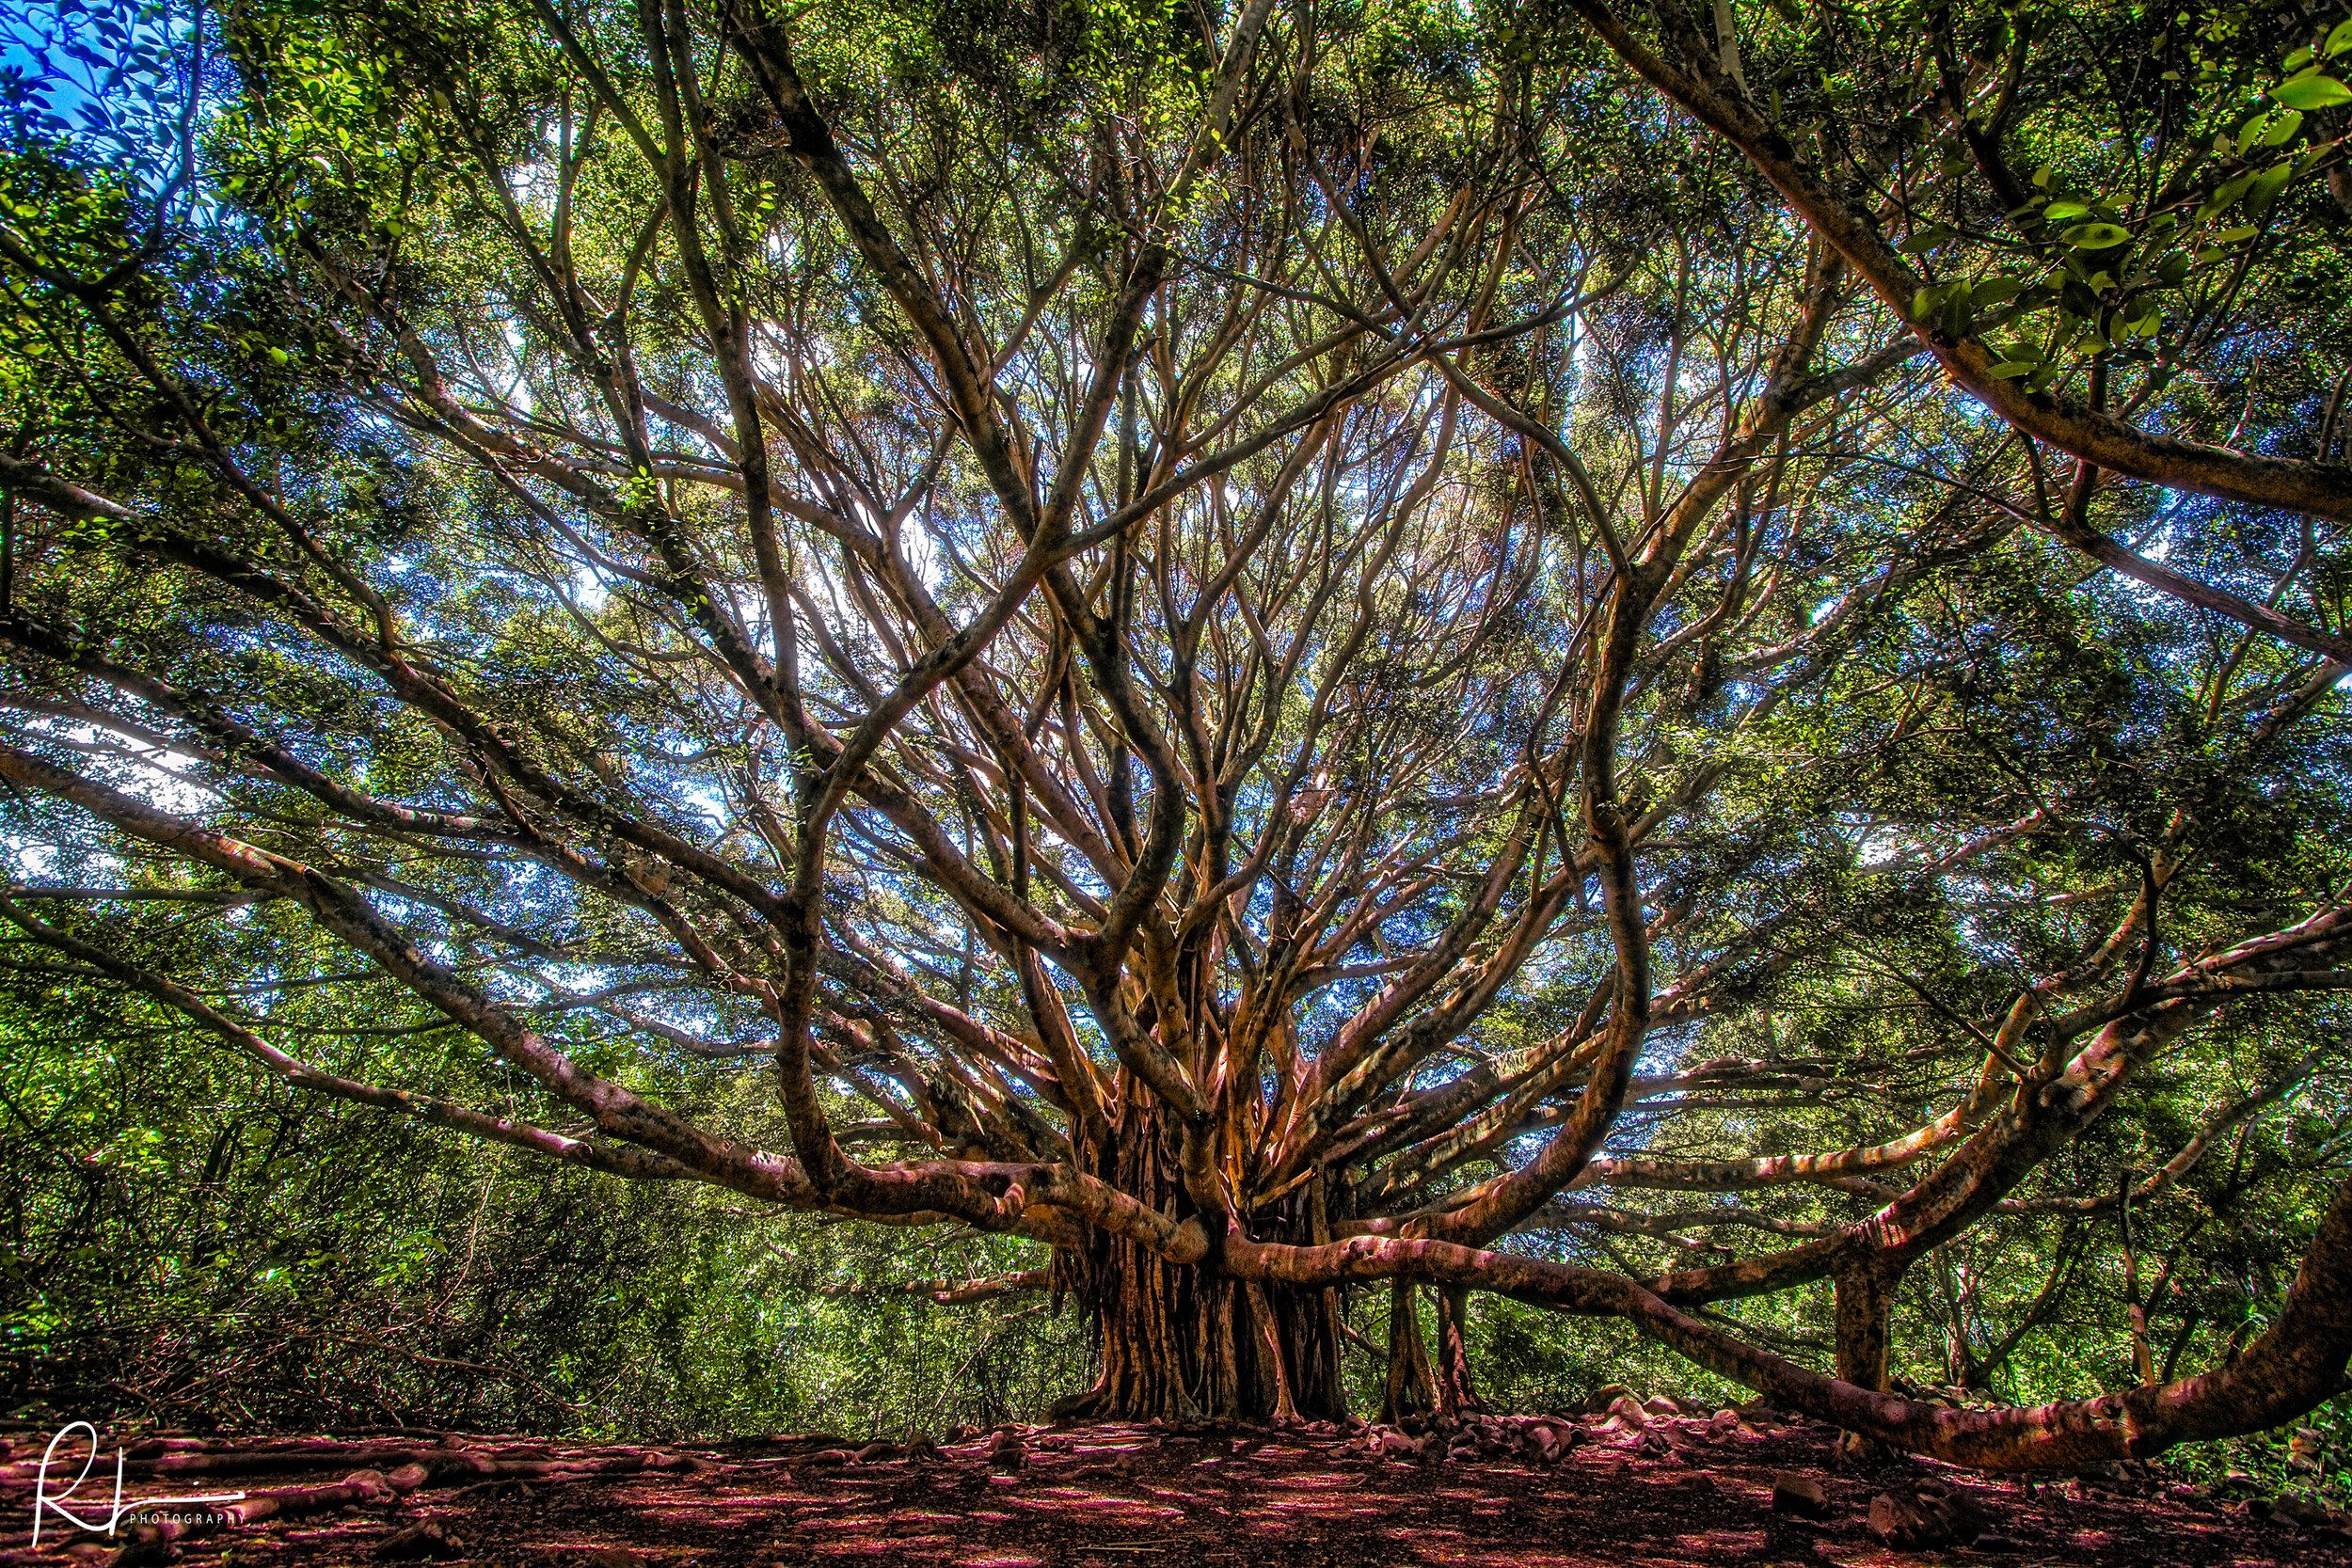 Banyan Tree in Maui